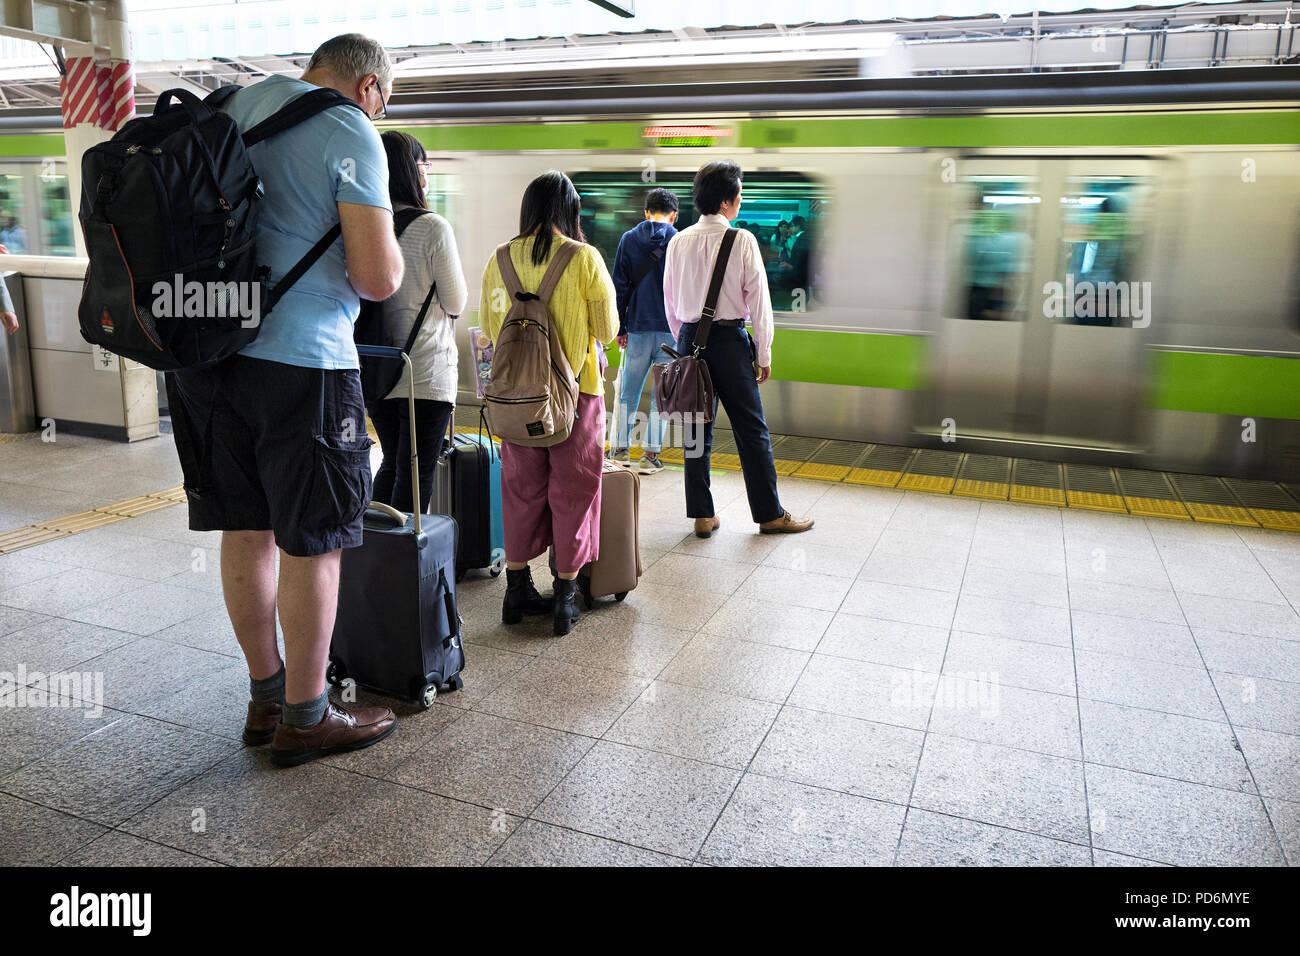 Japan, Honshu island, Kanto, Tokyo, people waitng a train on a platform. - Stock Image